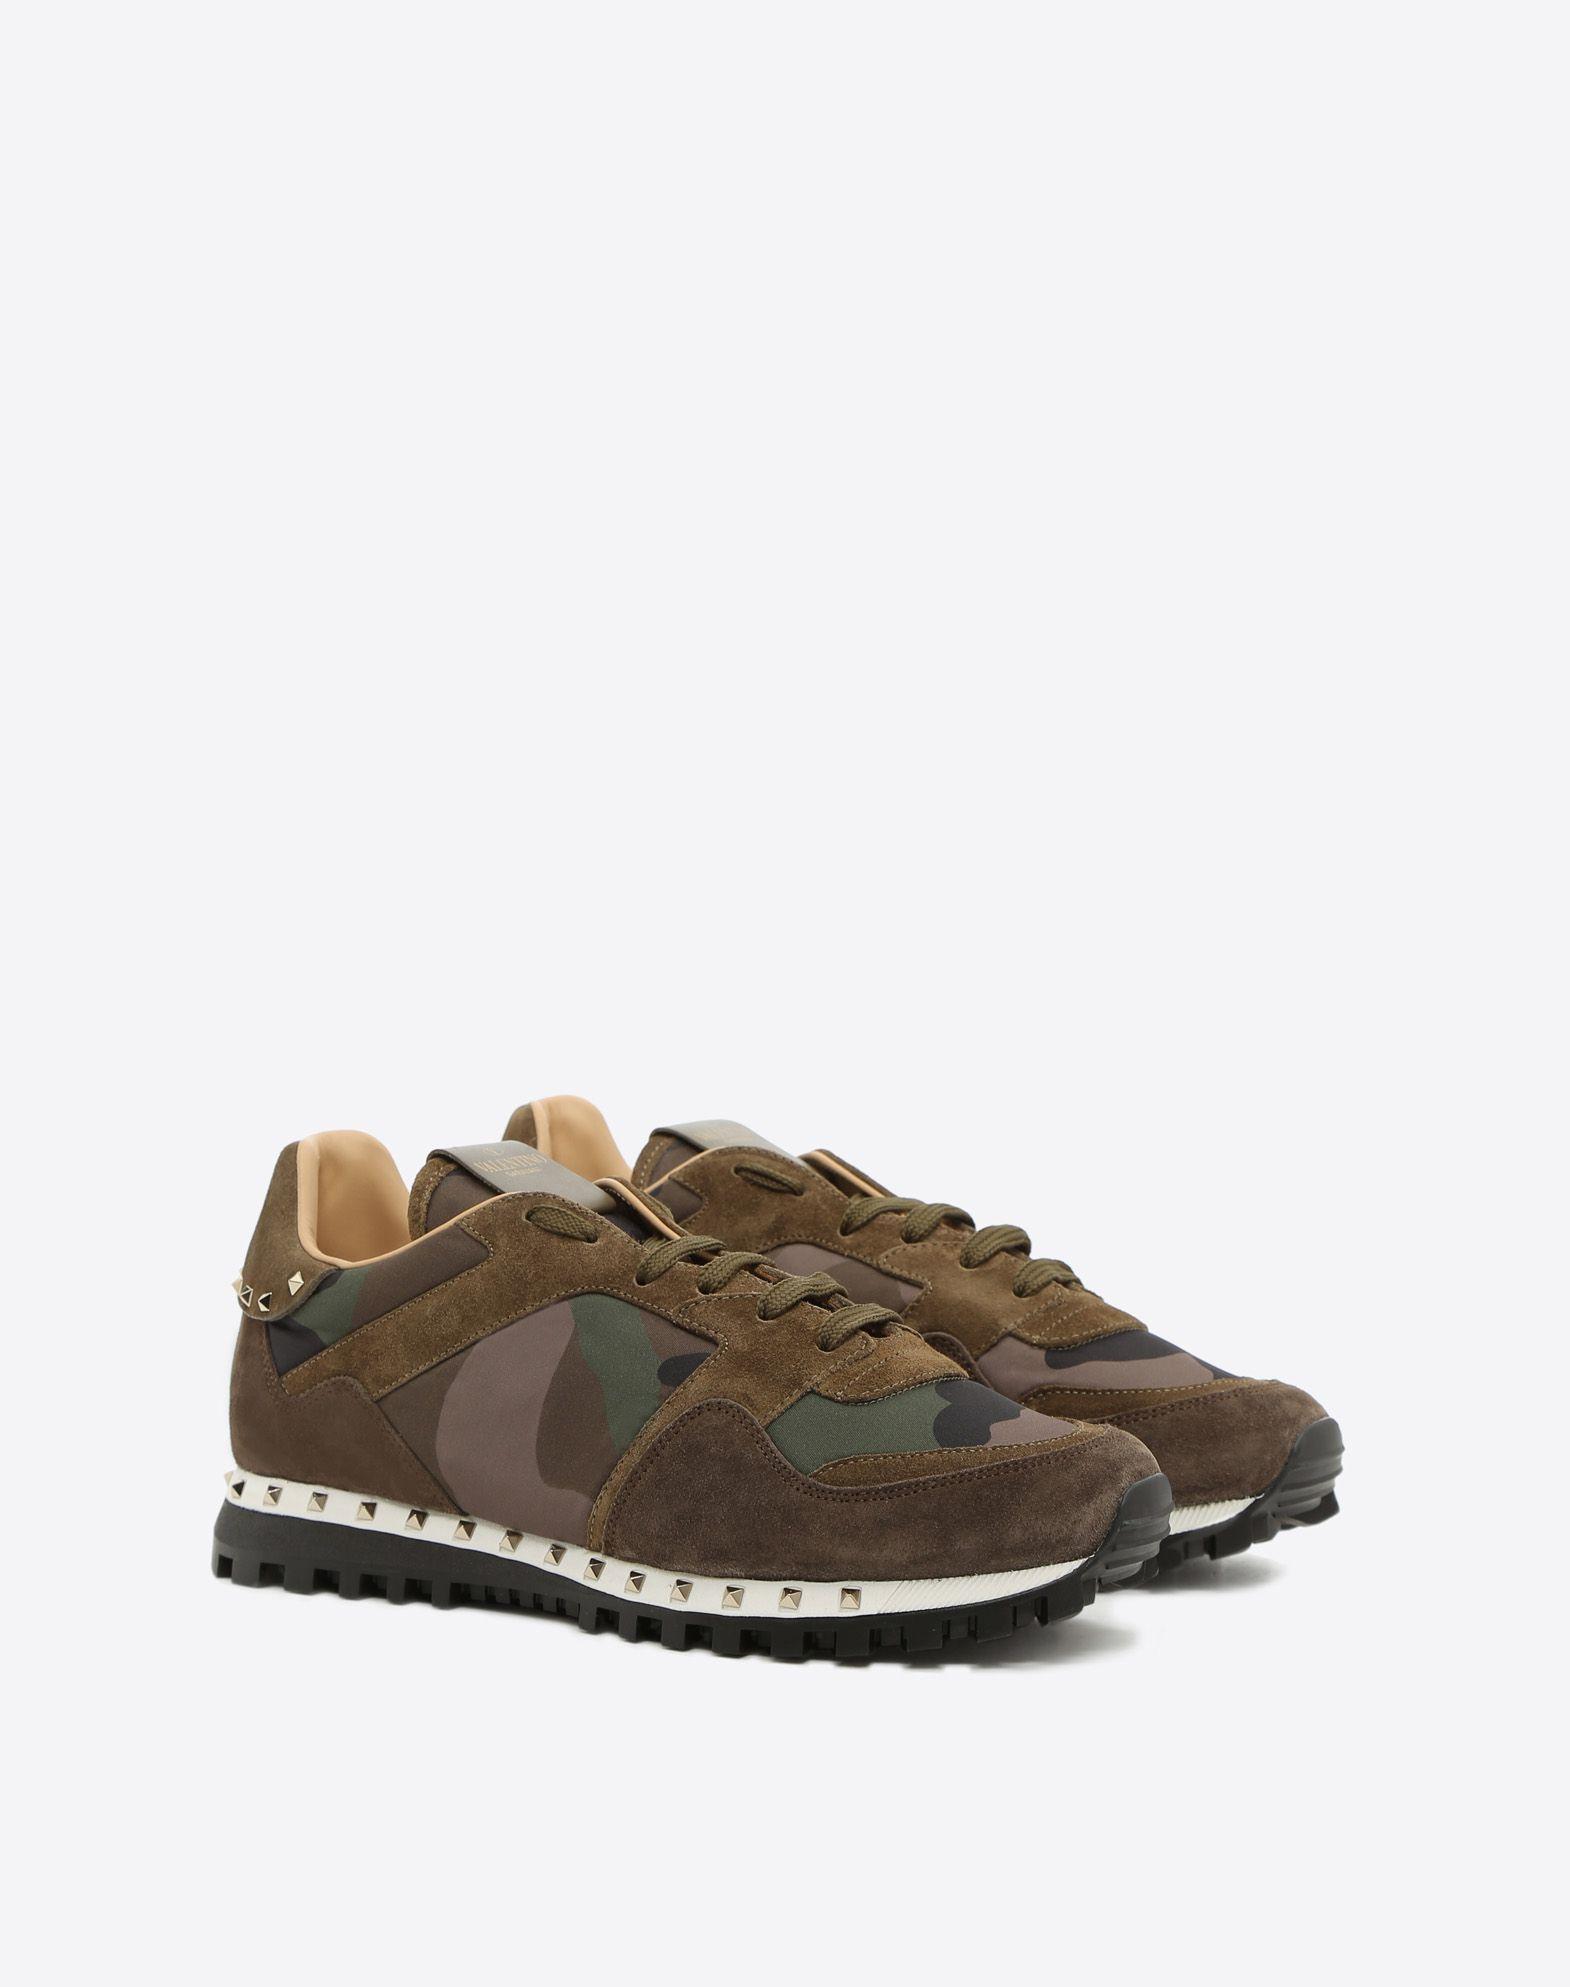 VALENTINO GARAVANI UOMO Camouflage Sneaker LOW-TOP SNEAKERS U r